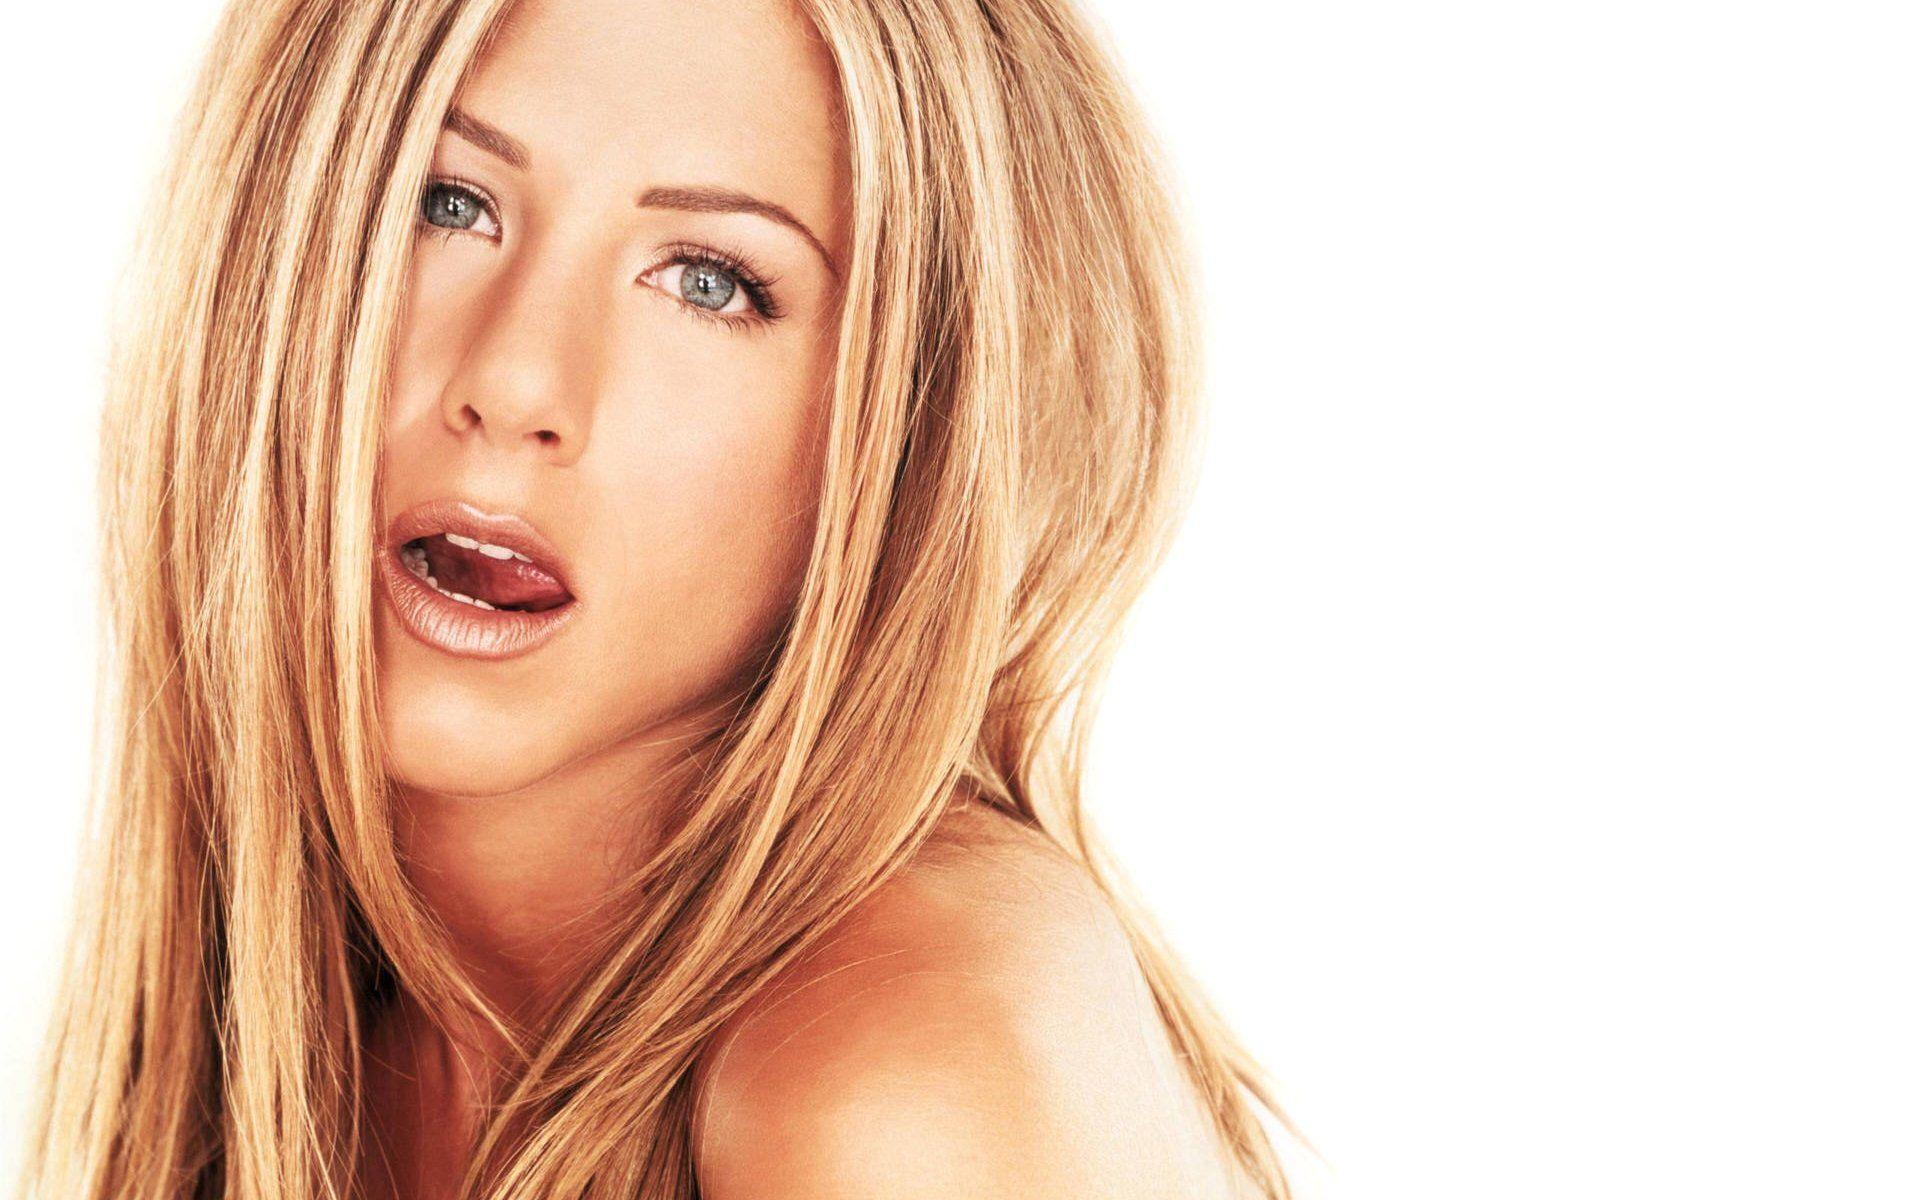 Jennifer Aniston Wallpapers Hd Wallpapers Base Jennifer Aniston Photos Jennifer Aniston Hot Jennifer Aniston Hair